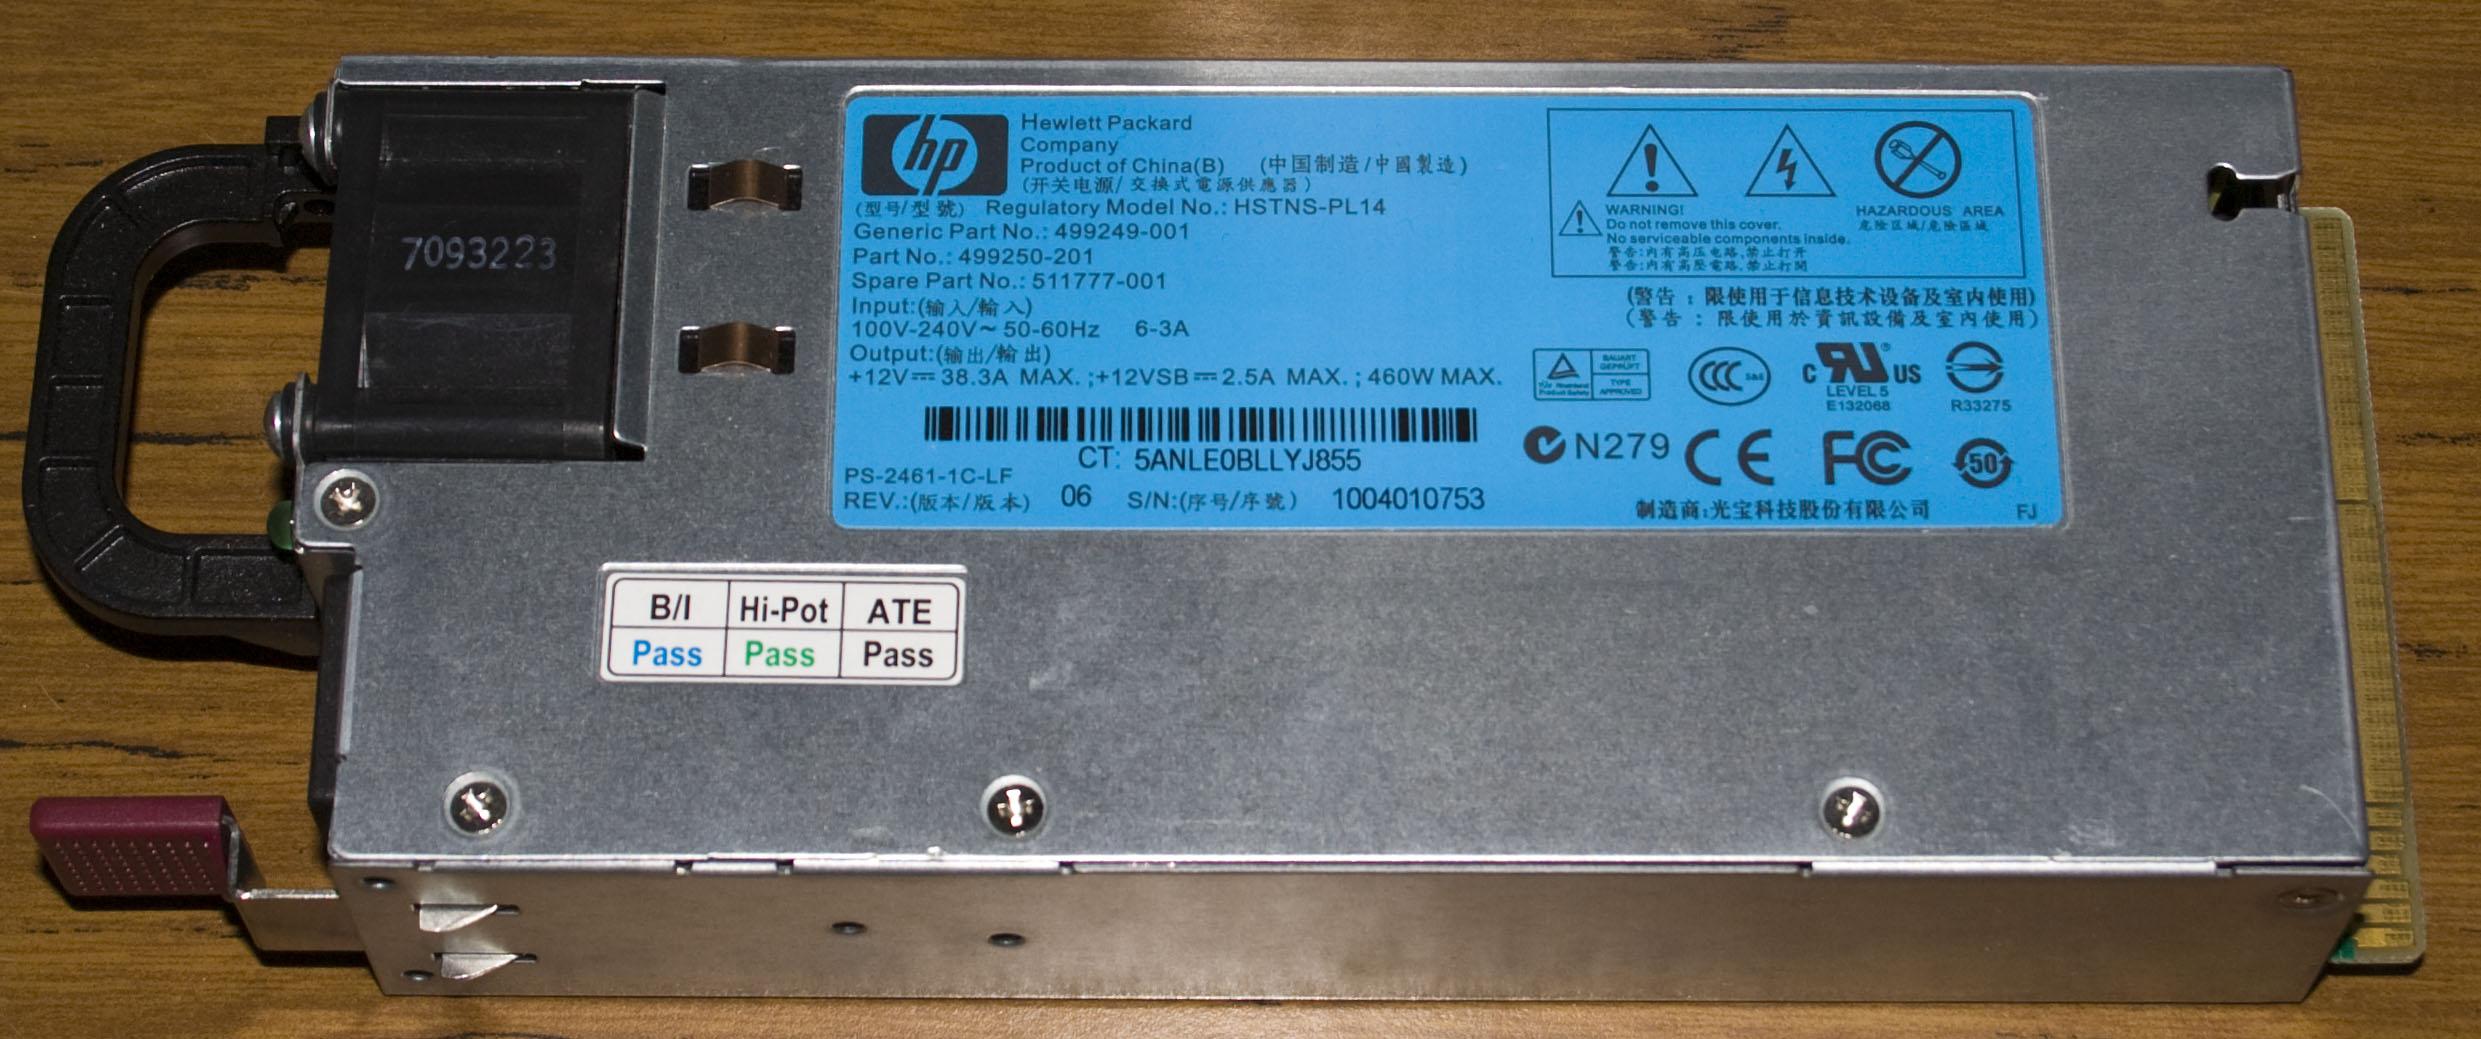 Inside the HP ML350 G6 Server Hot Plug Power Supply « insideGadgets